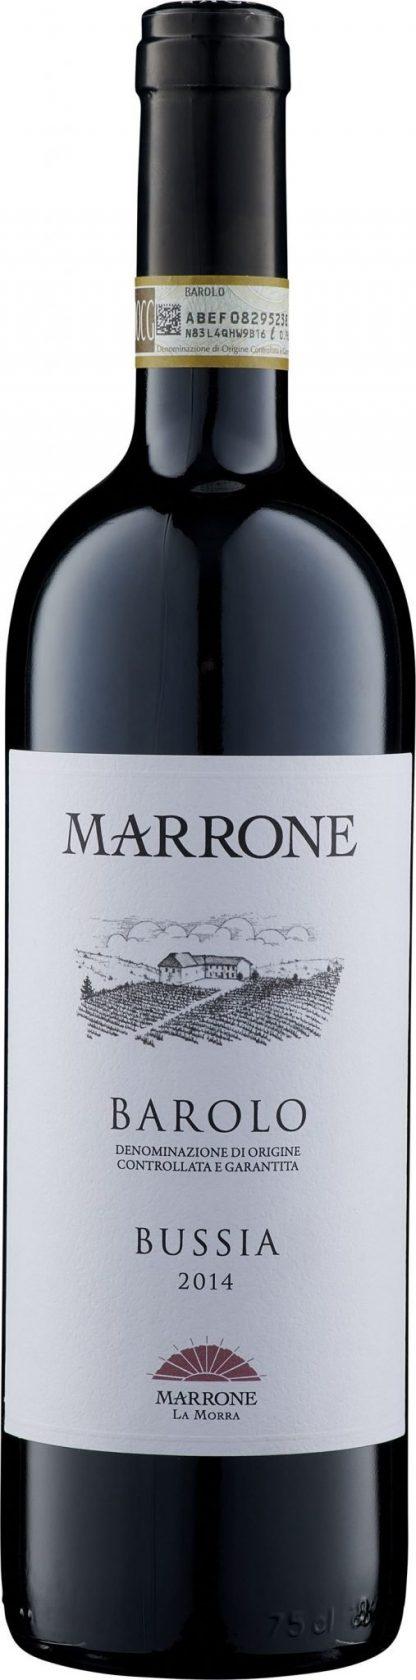 "Marrone - Barolo DOCG ""Bussia"" 2014"